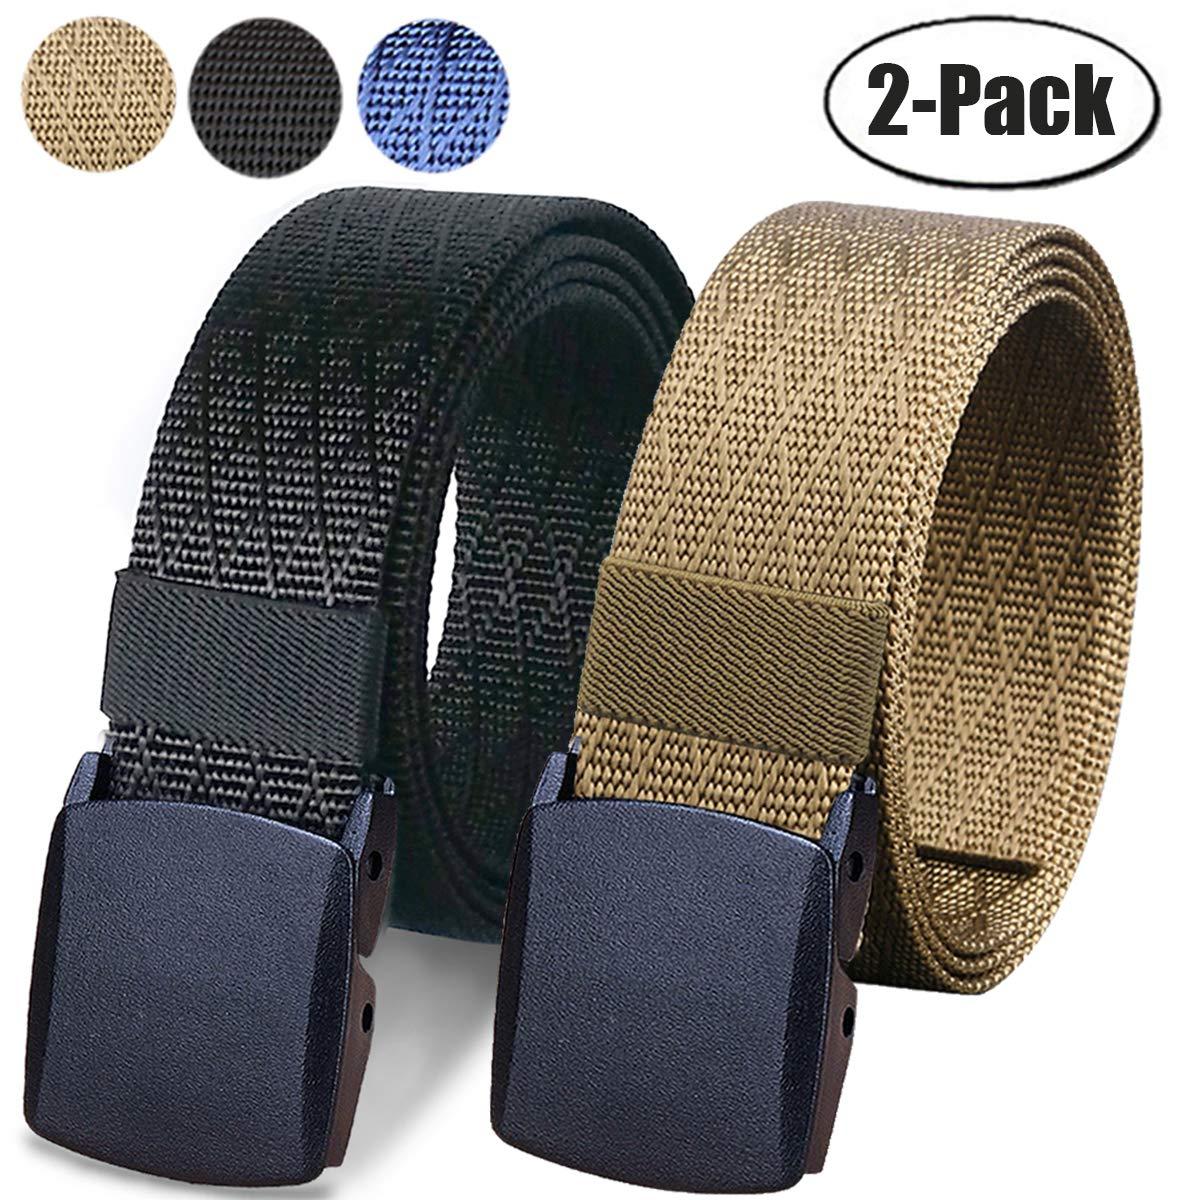 WYuZe 2 Pack Nylon Belt, Outdoor Military Web Belt Men's Tactical Webbing Belt (bbrown)